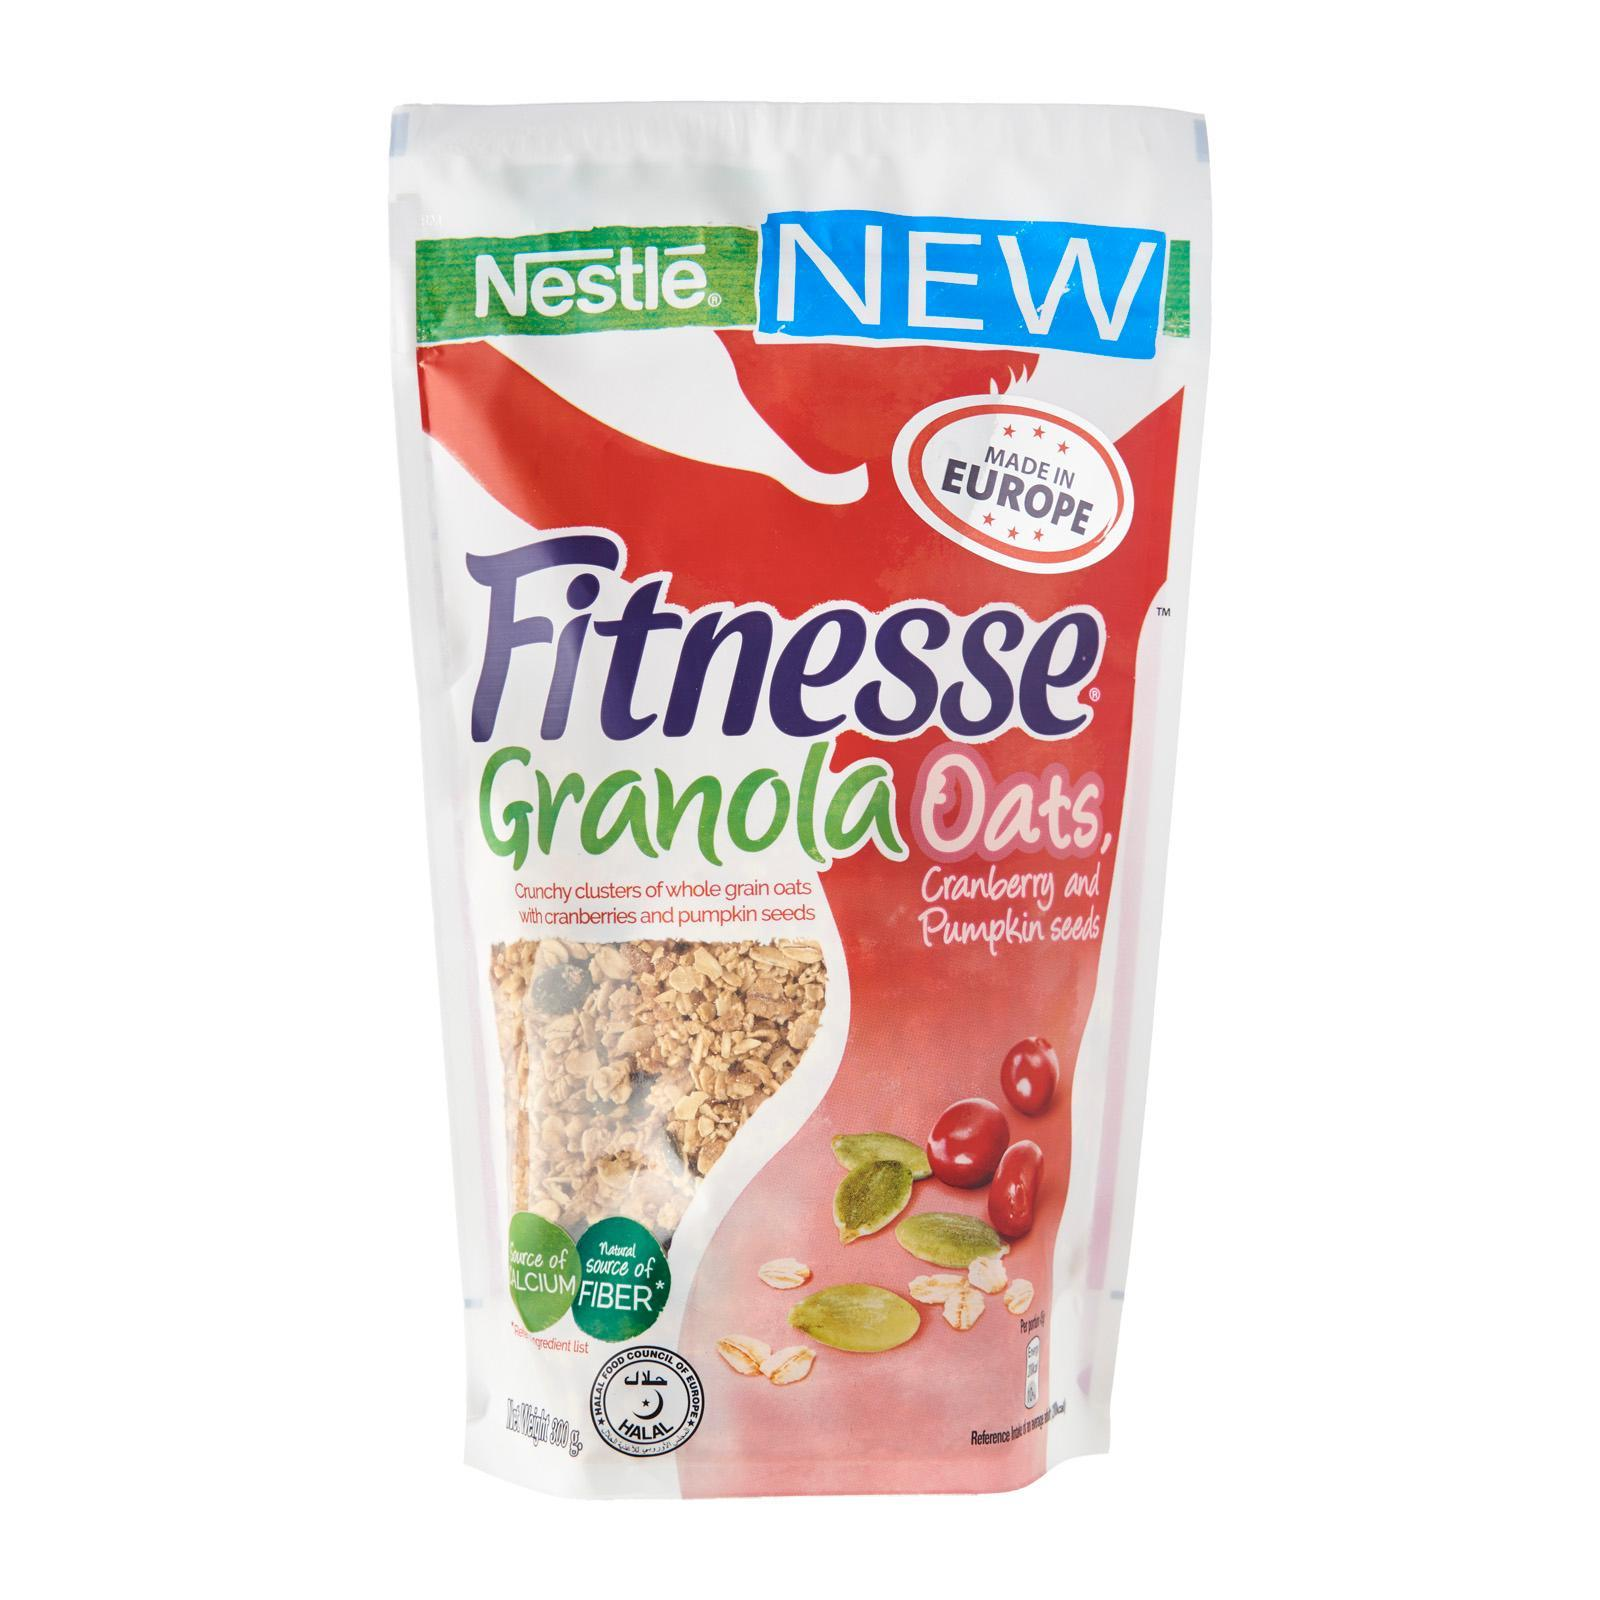 NESTLE Fitnesse Granola Oats, Cranberry & Pumpkin Seeds 300g